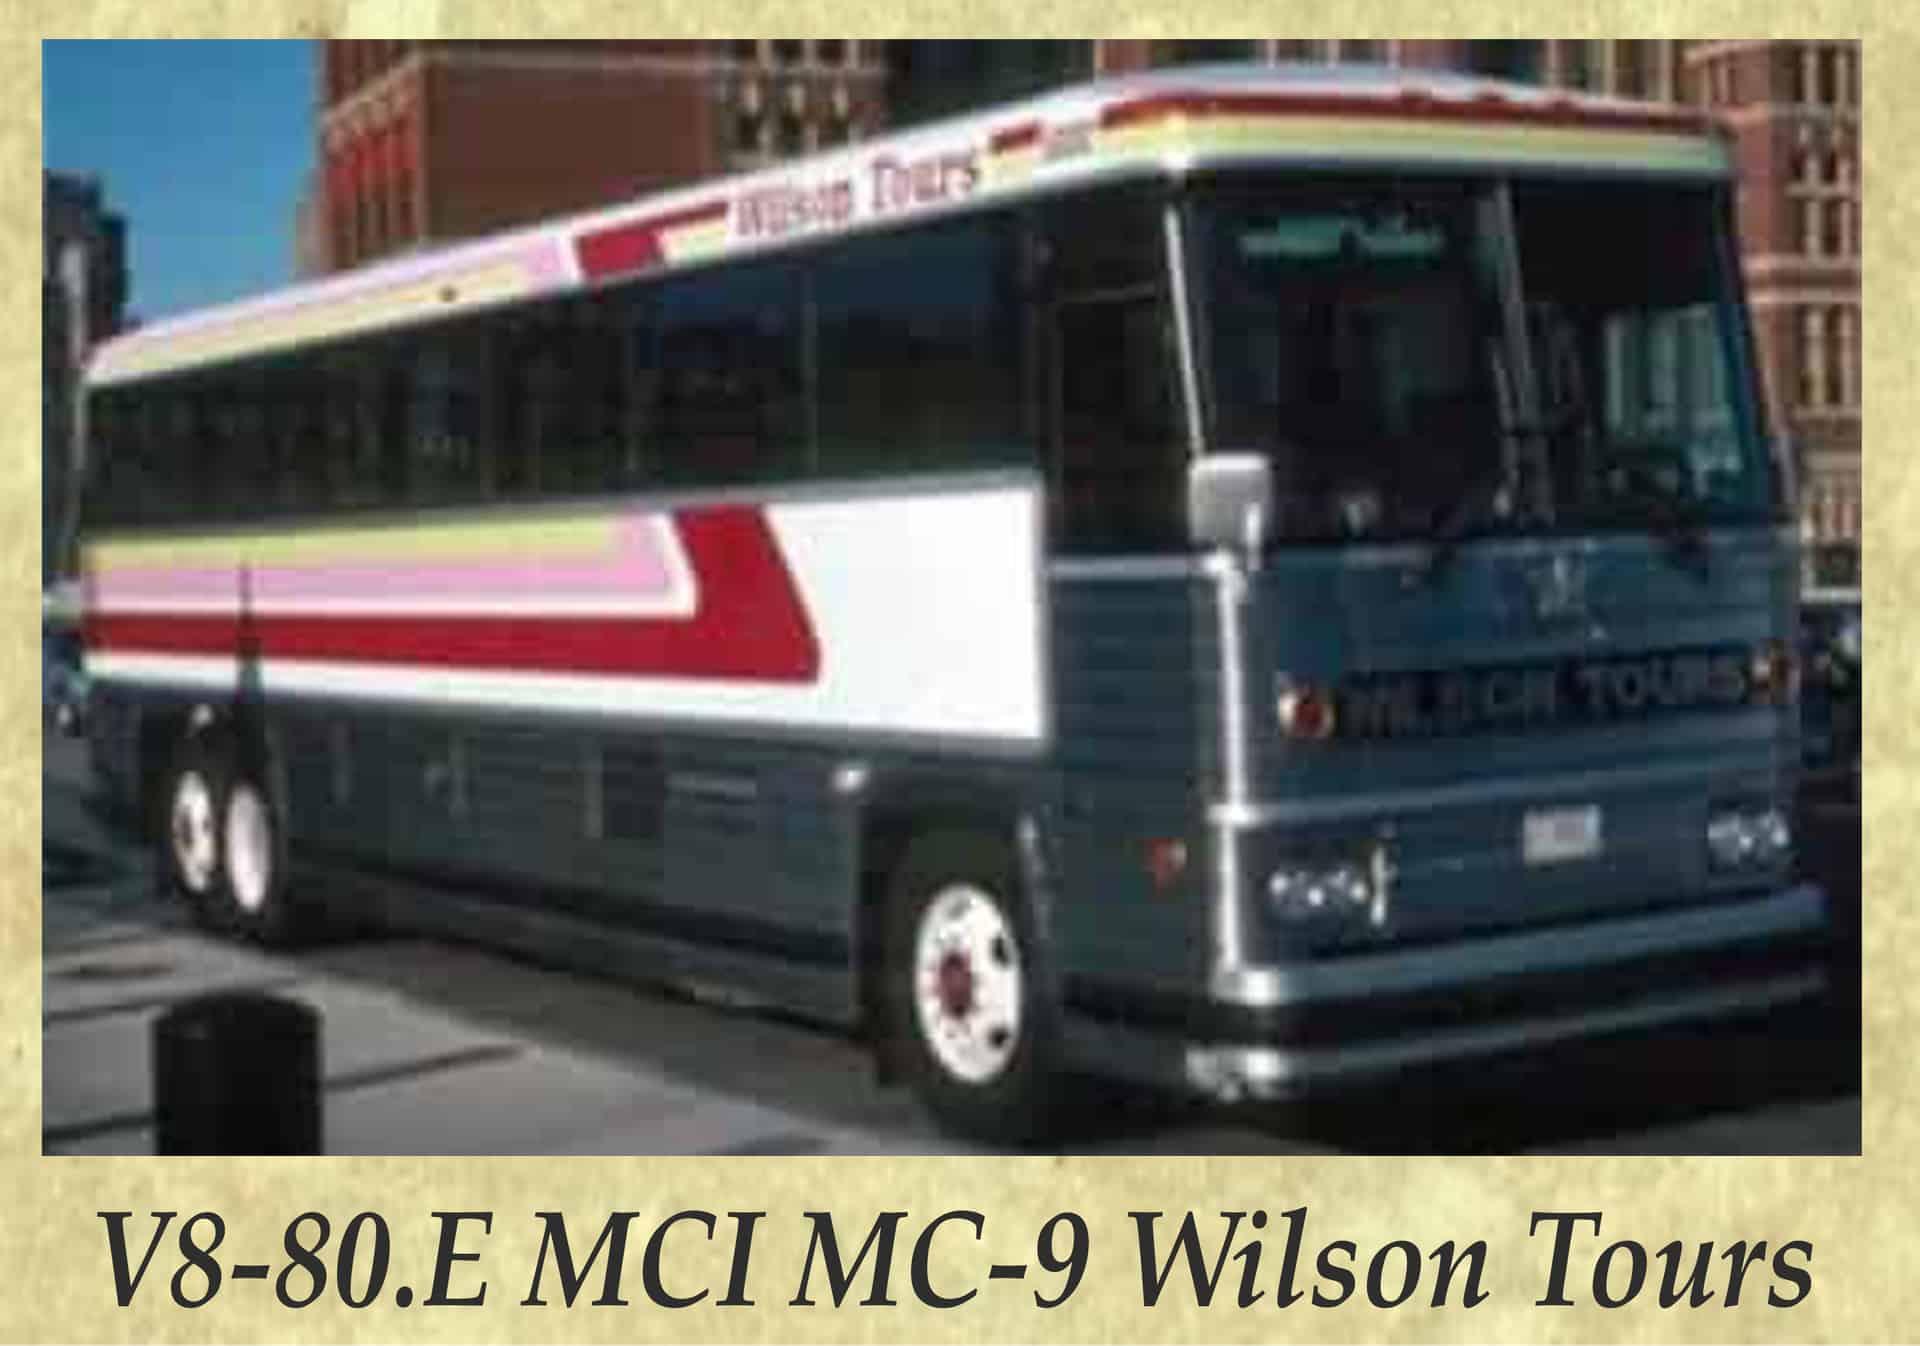 V8-80.E MCI MC-9 Wilson Tours